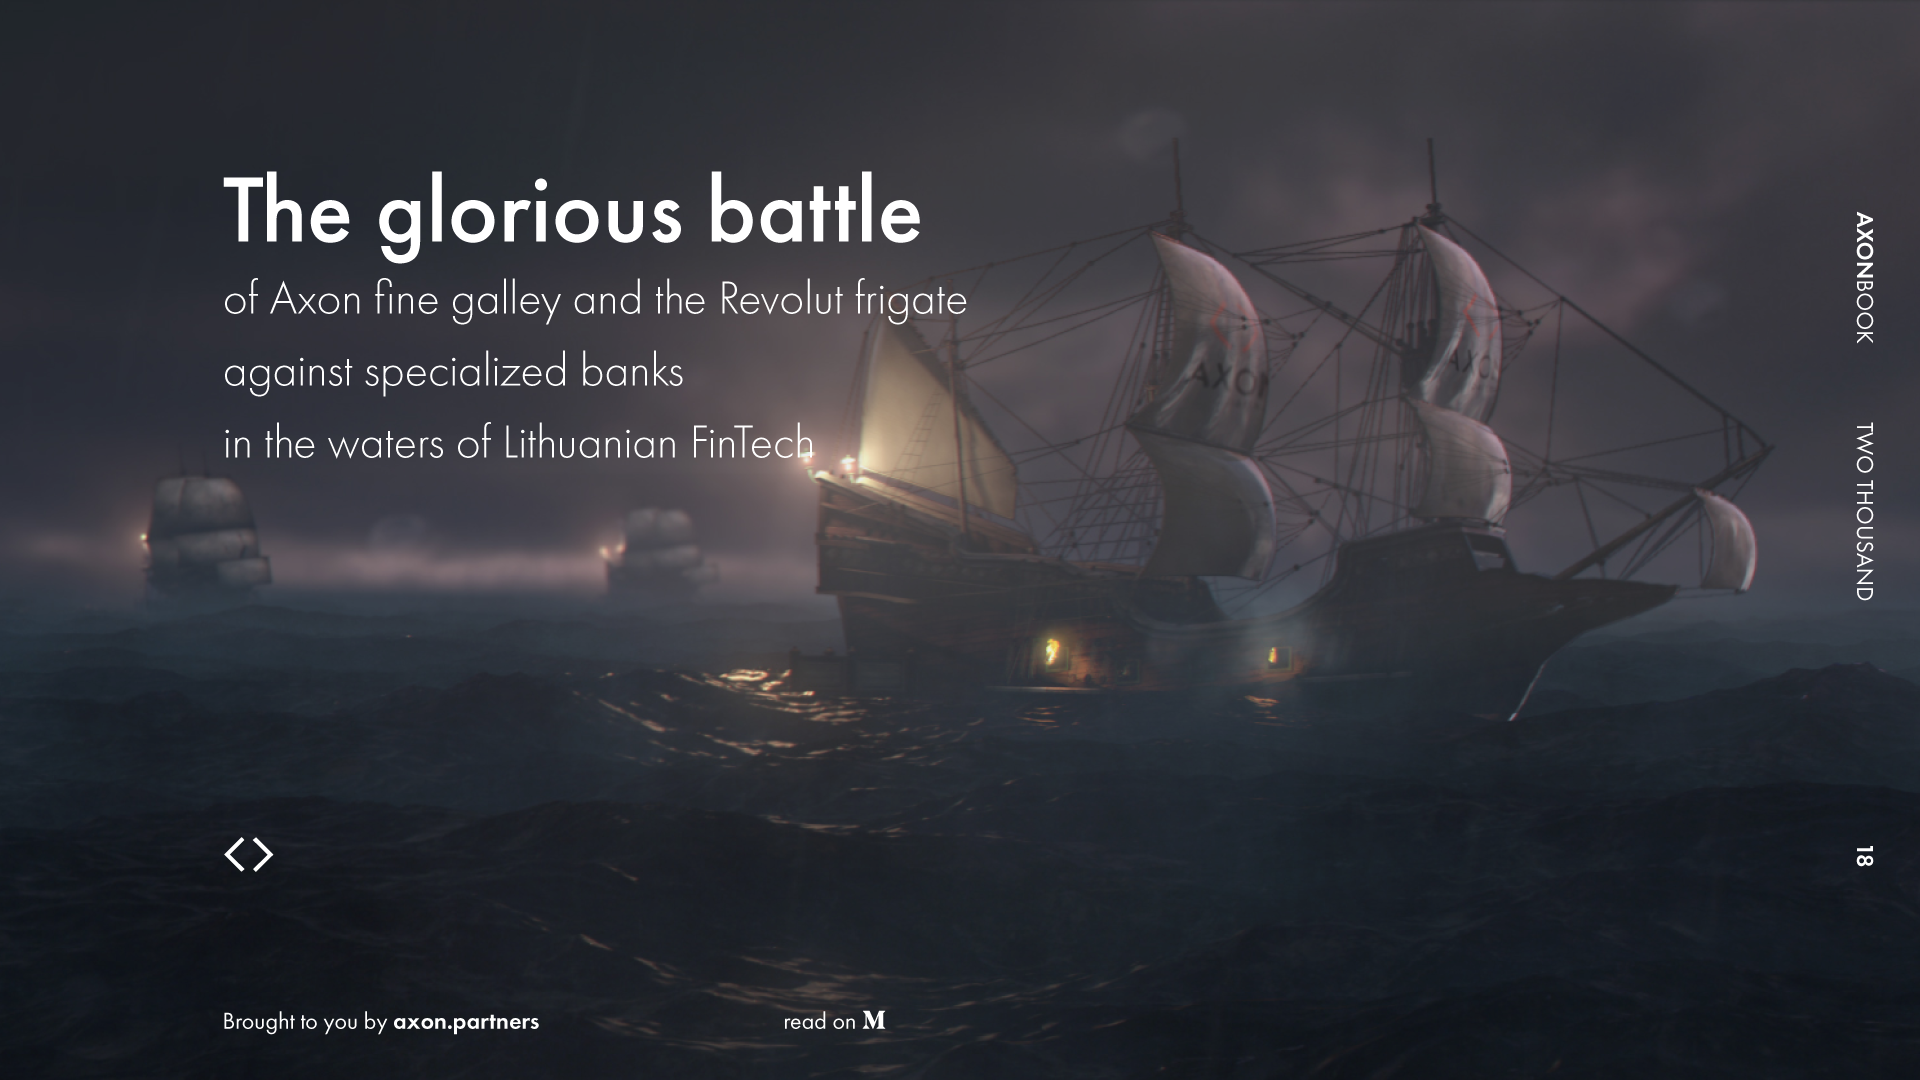 battleship_en